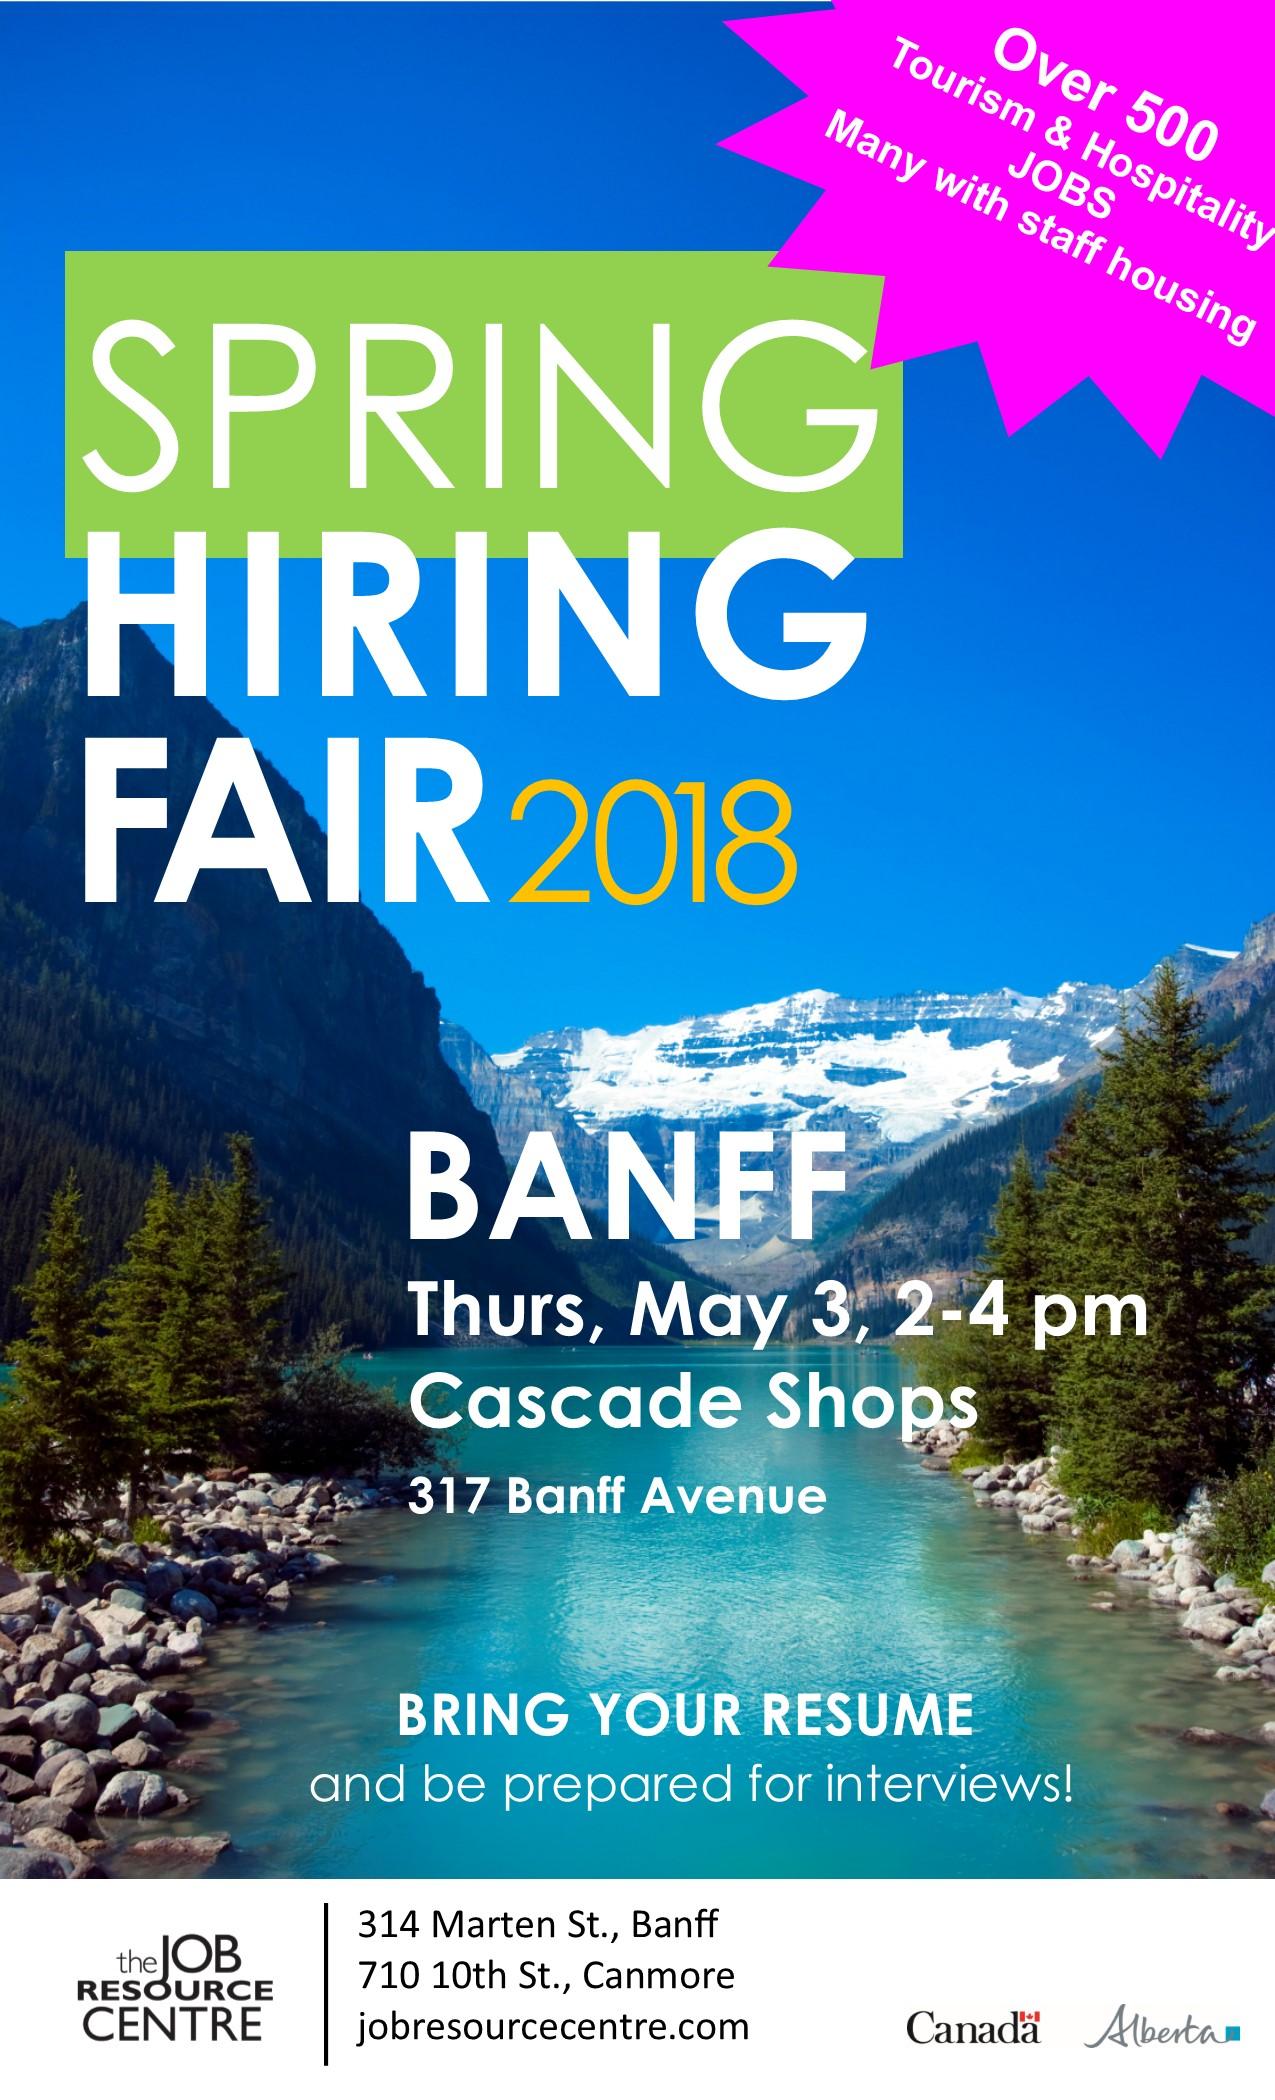 Banff Spring Hiring Fair Poster 2018 500.jpg